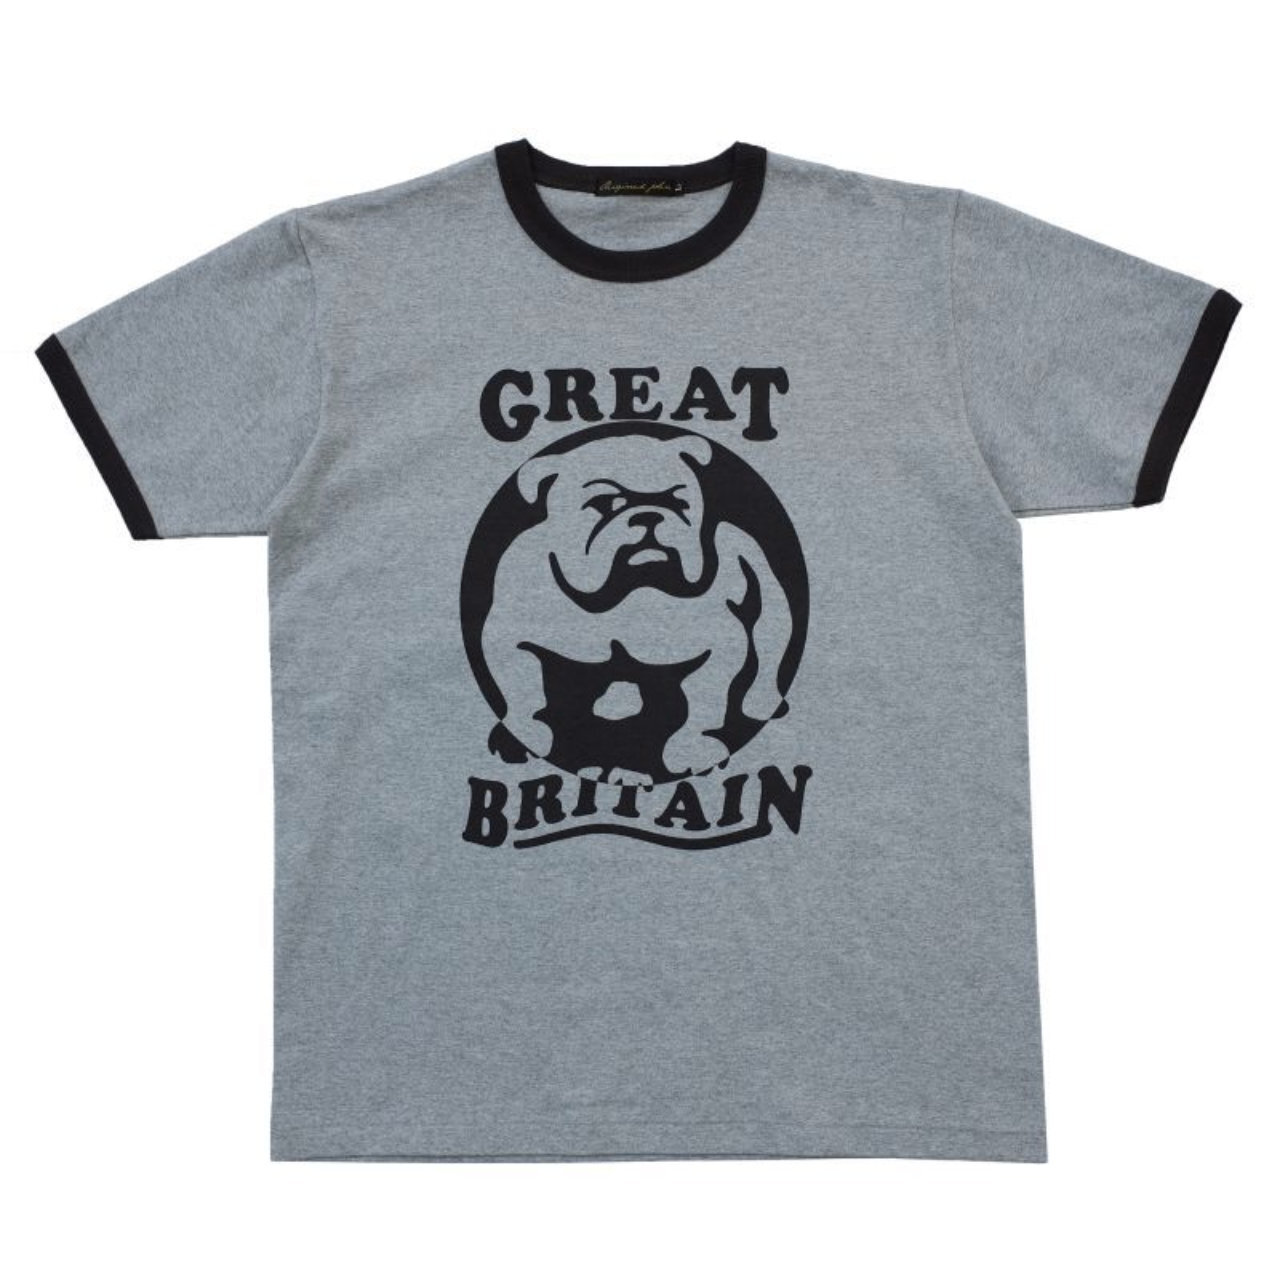 【Original John】 ブルドッグ プリント リンガー Tシャツ 〈Grey×Black〉